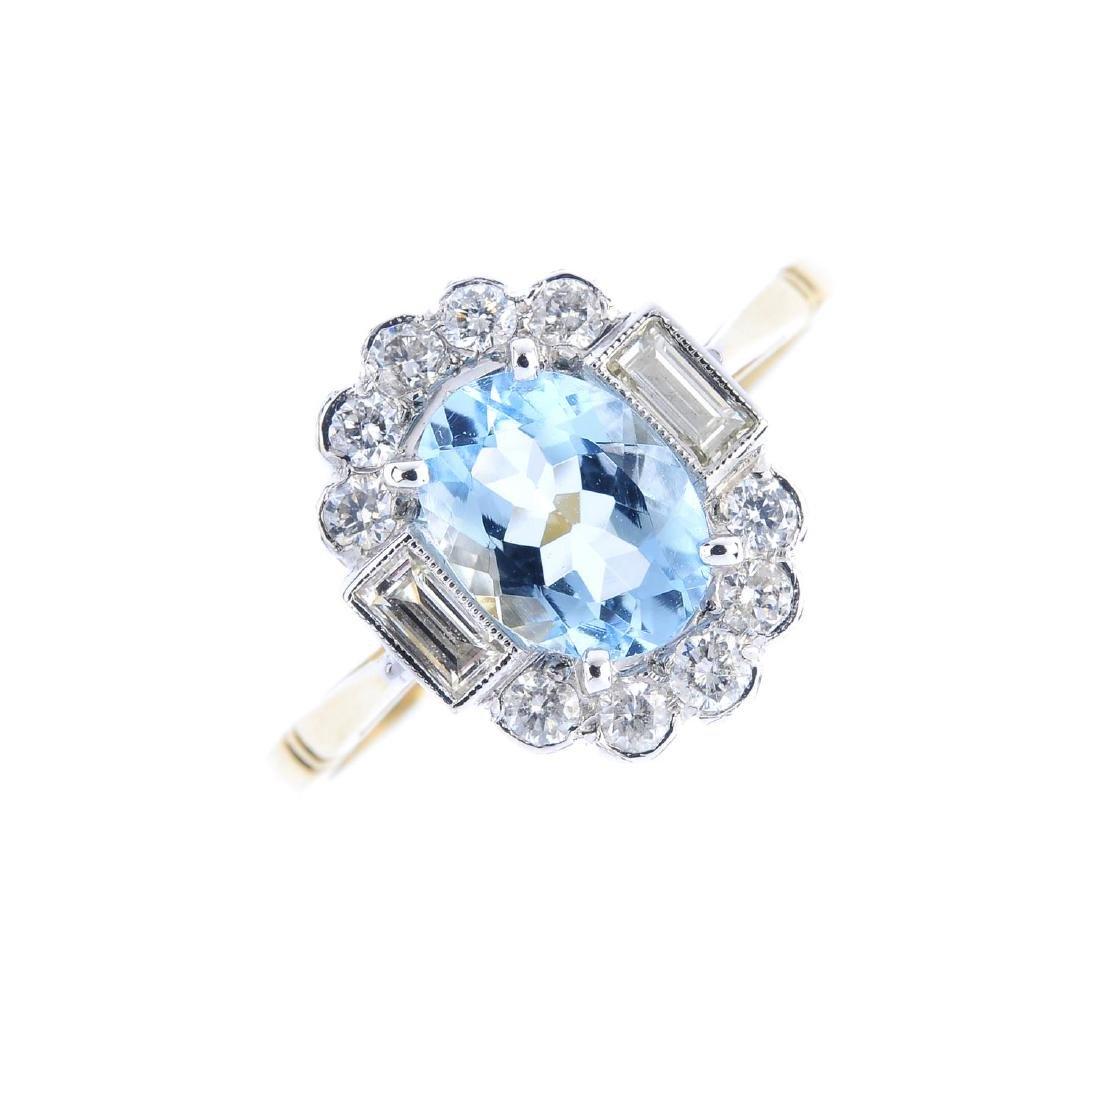 An aquamarine and diamond dress ring. The oval-shape